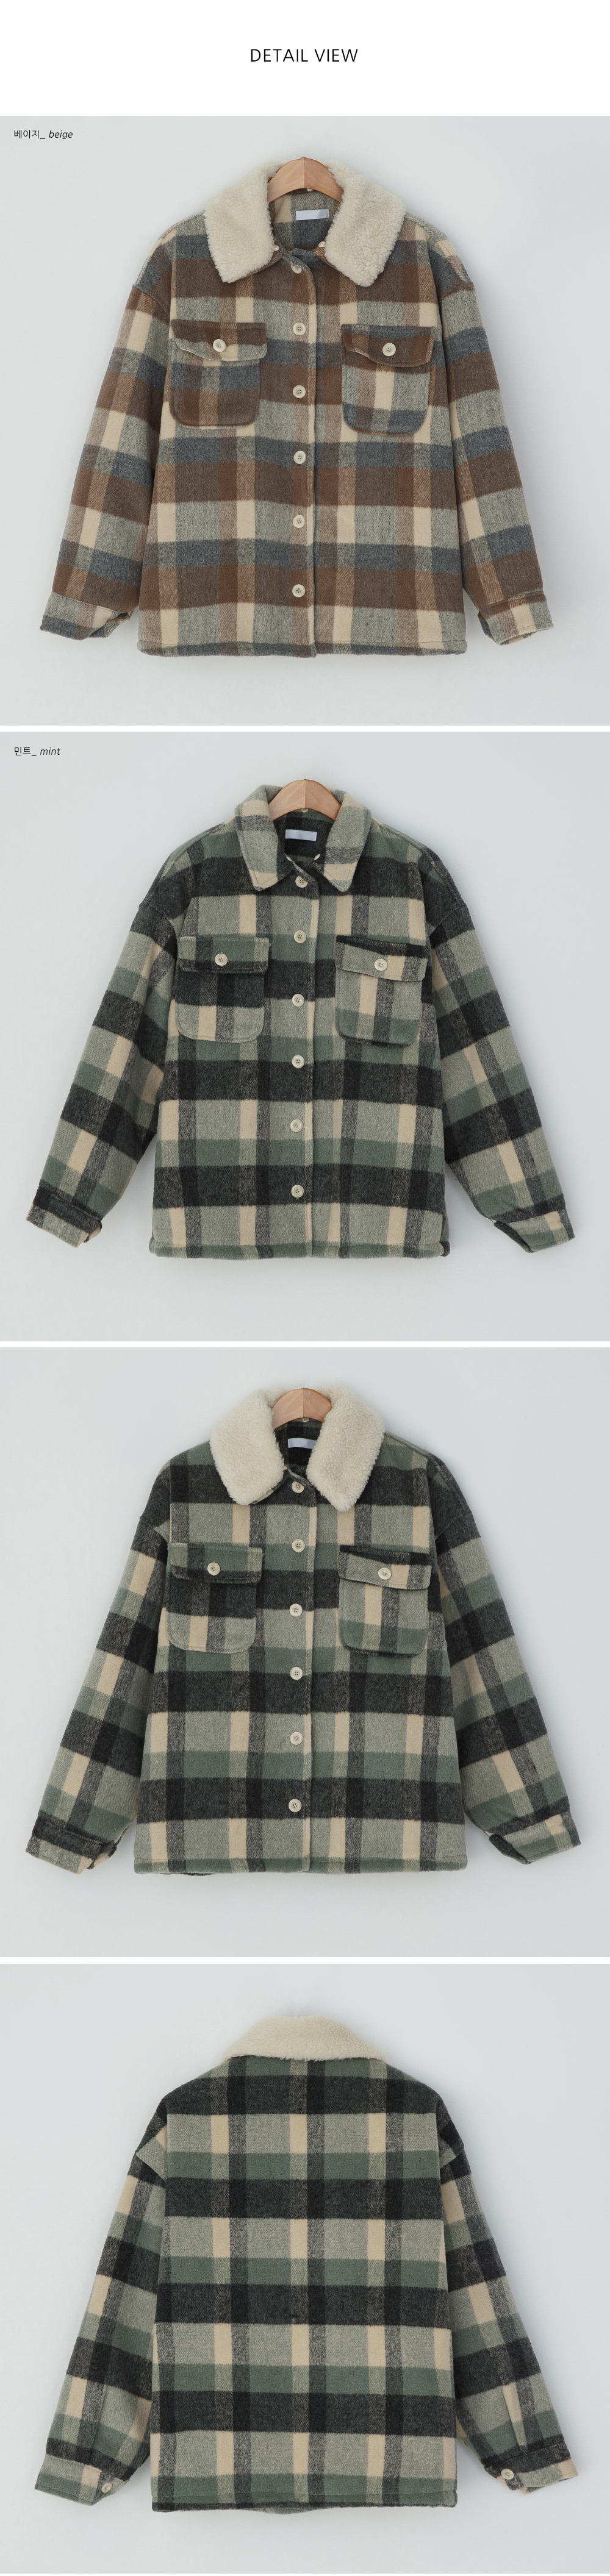 Perkara Check Wool Jacket